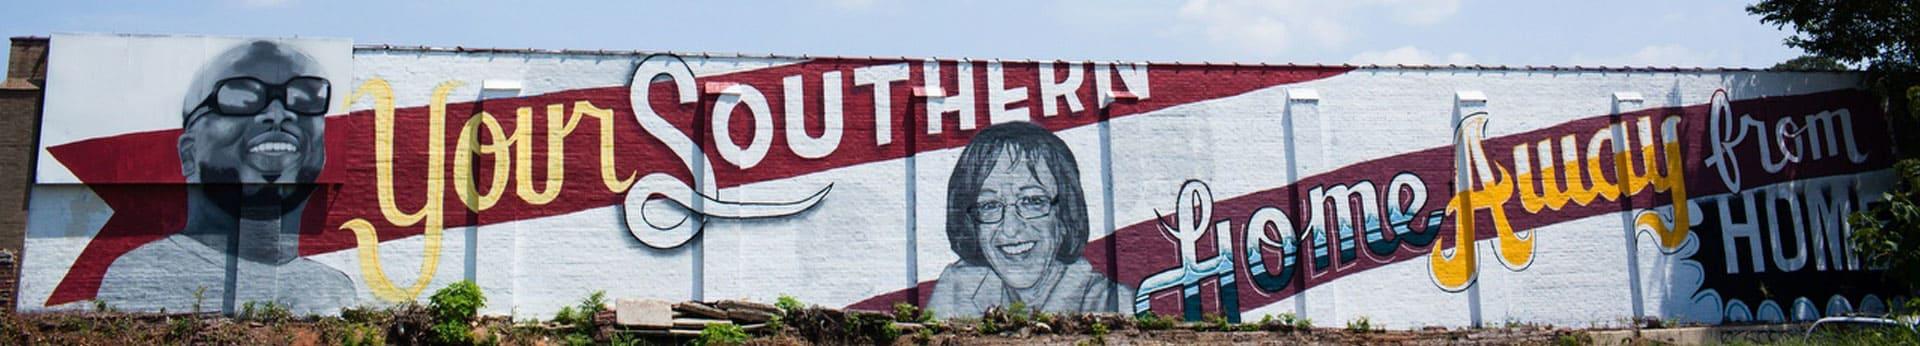 Living Walls Street Art And Urbanism In Atlanta